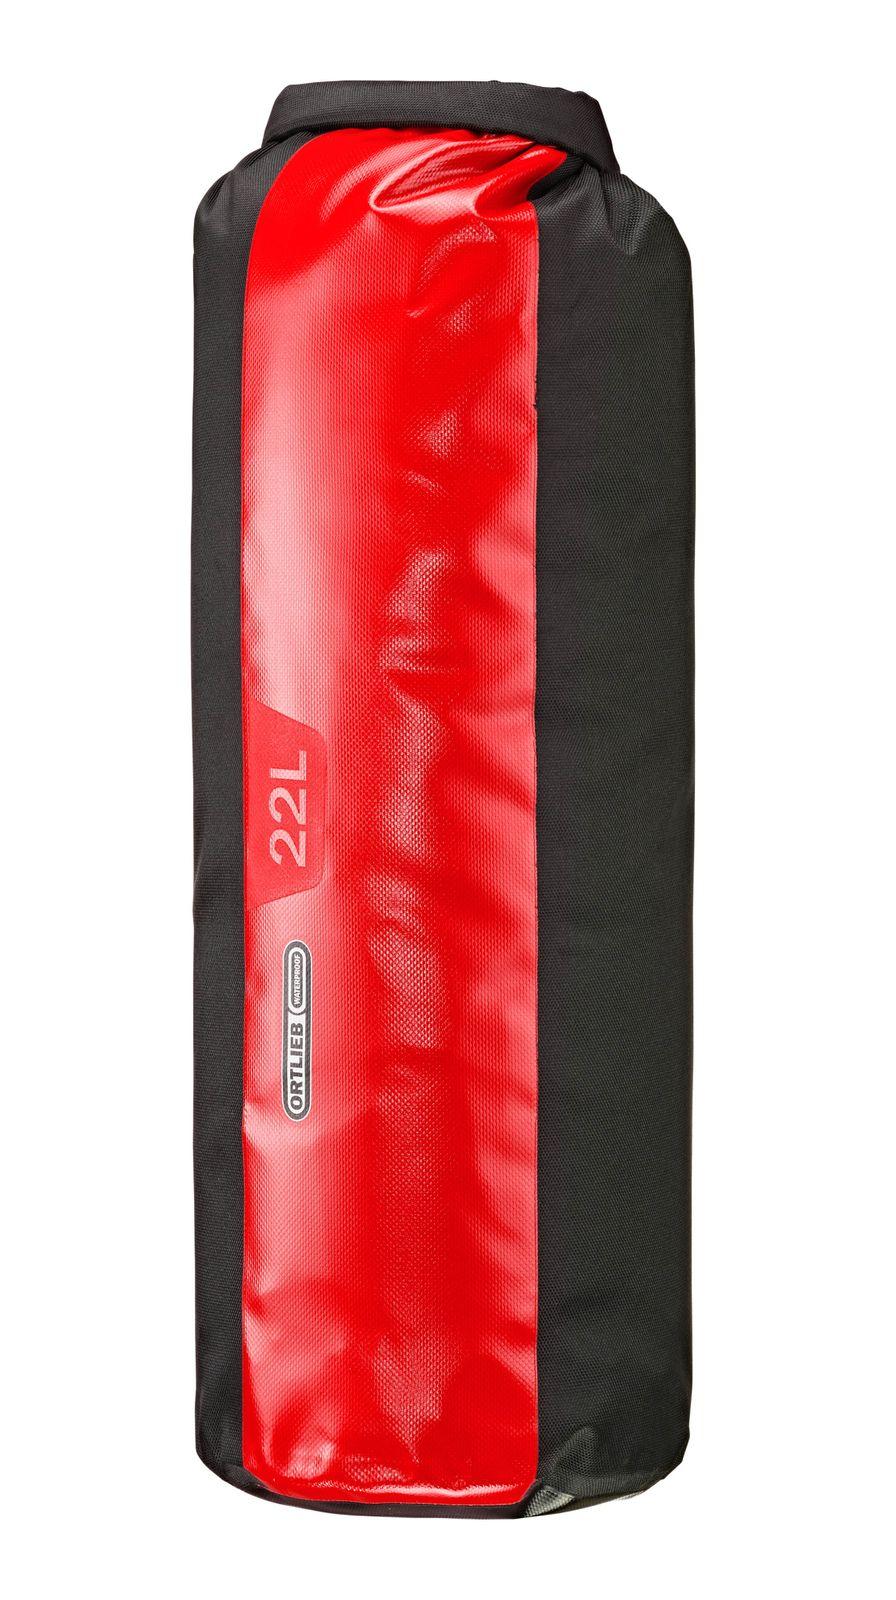 ORTLIEB Dry-Bag PS490 22L Black-Red